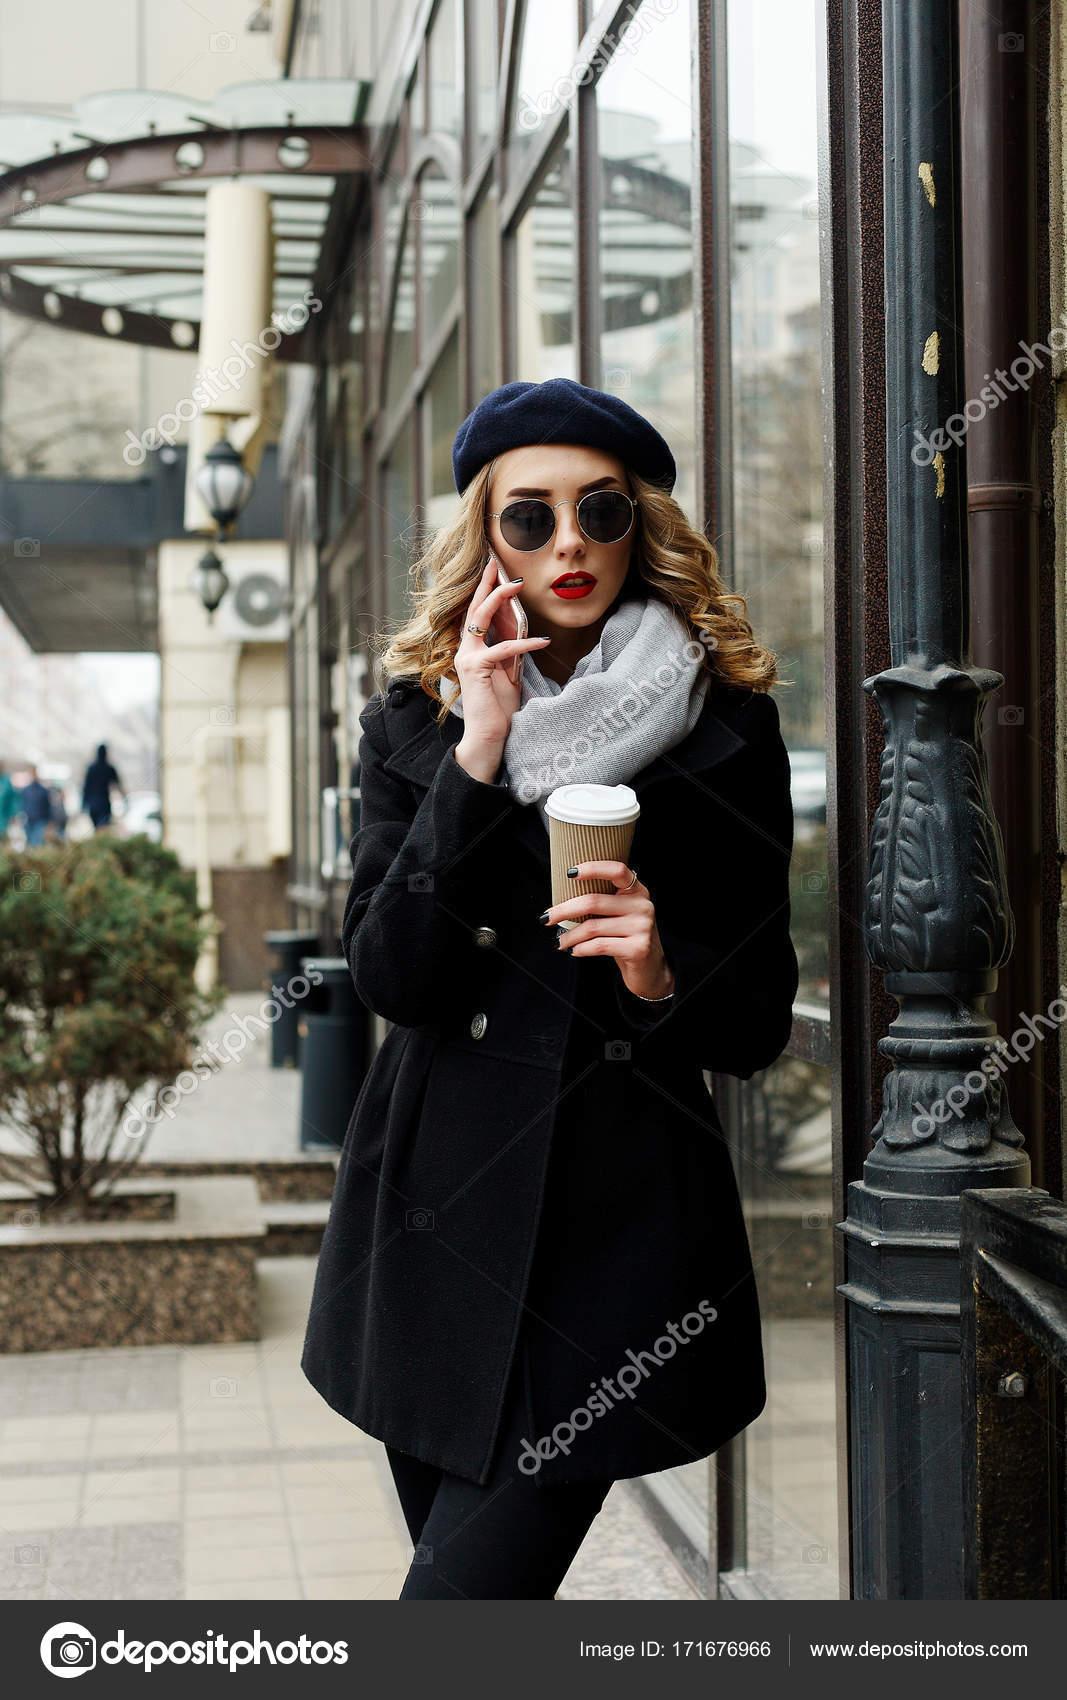 342d4f0838f3 Φωτογραφία δρόμου νεαρή όμορφη γυναίκα που φοράει μοντέρνα κλασικά ρούχα —  Φωτογραφία Αρχείου